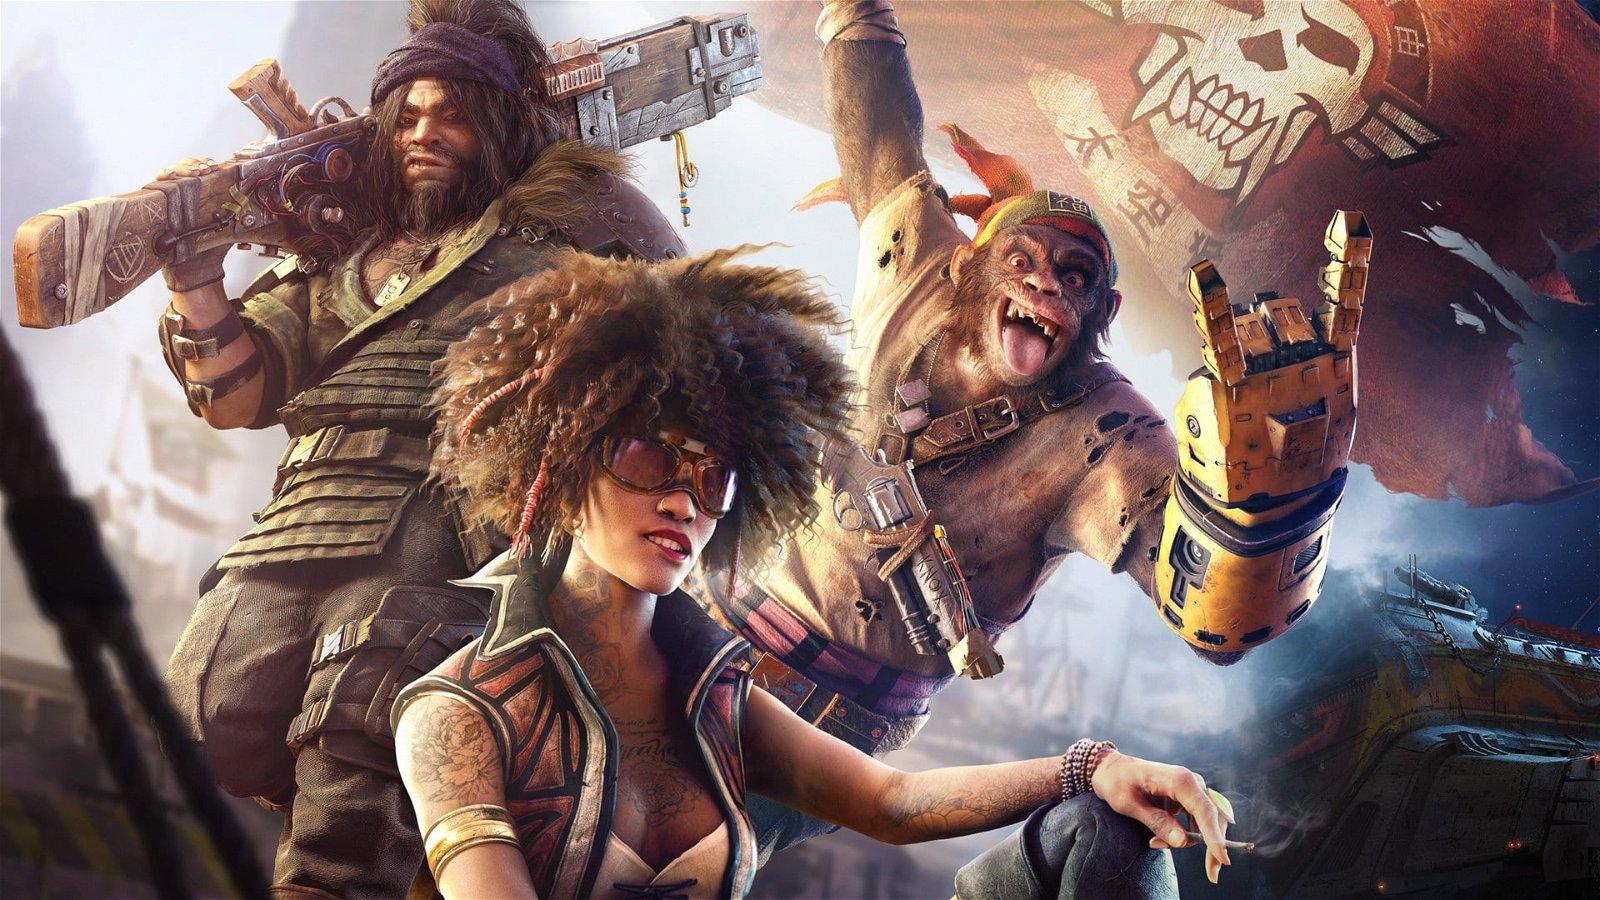 Ubisoft Explains How Next-Gen Factors into Upcoming Games